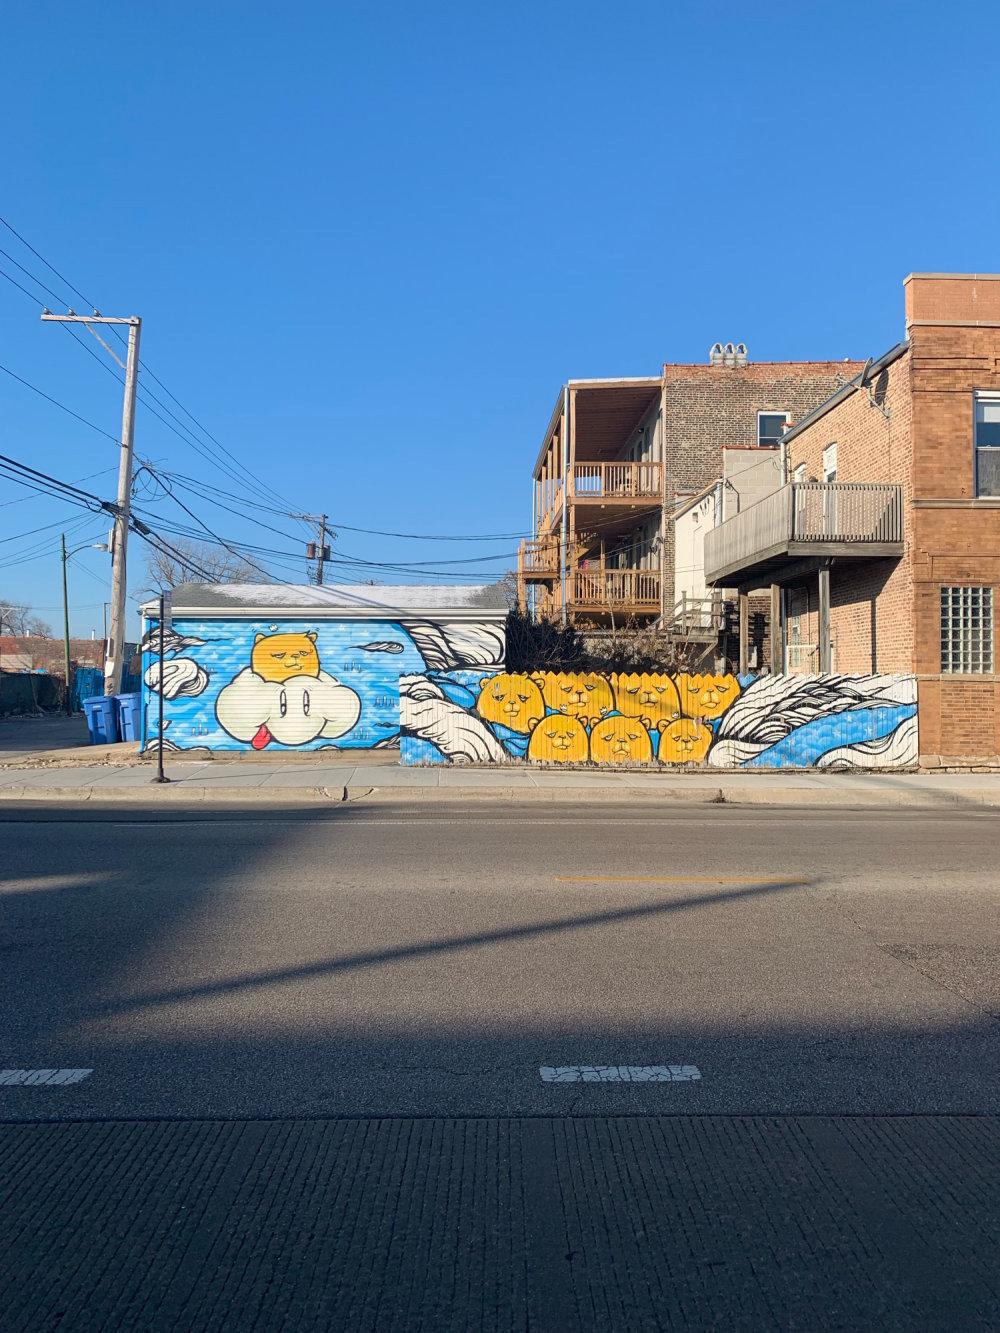 mural in Chicago by artist Jc Rivera